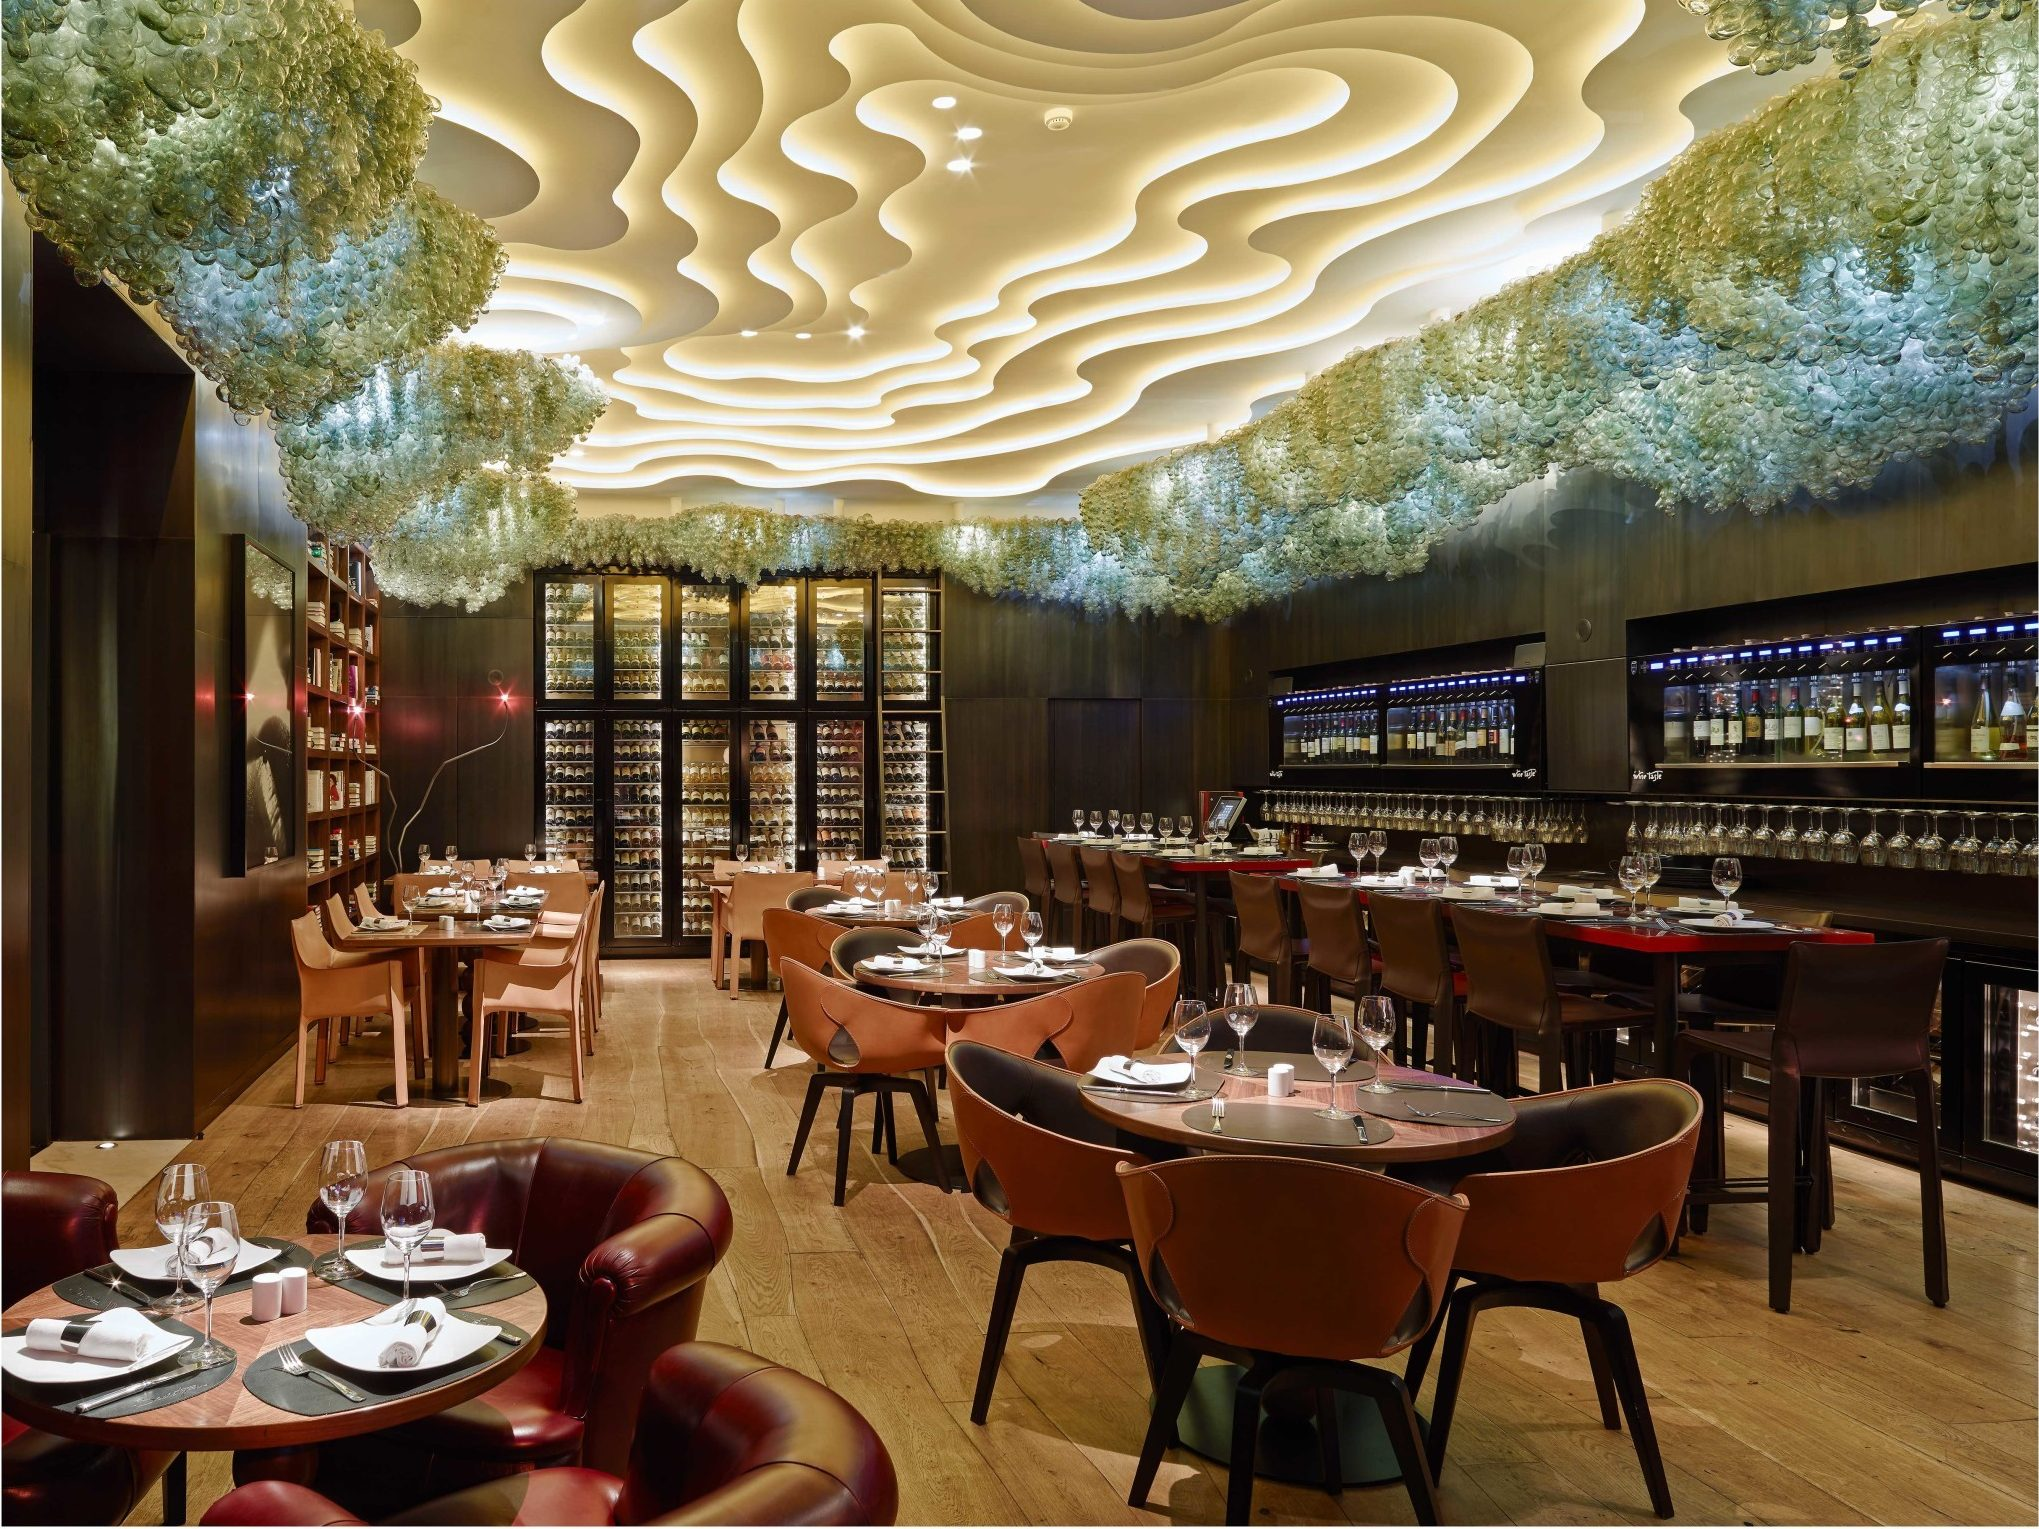 Gatserelia Design - Society Wine lounge Saifi Suites Downtown Beirut - top interior designers restaurant design Glowing Vienna Restaurant Design by Gatserelia Society Wine lounge Saifi SuitesvDowntown e1518232385749